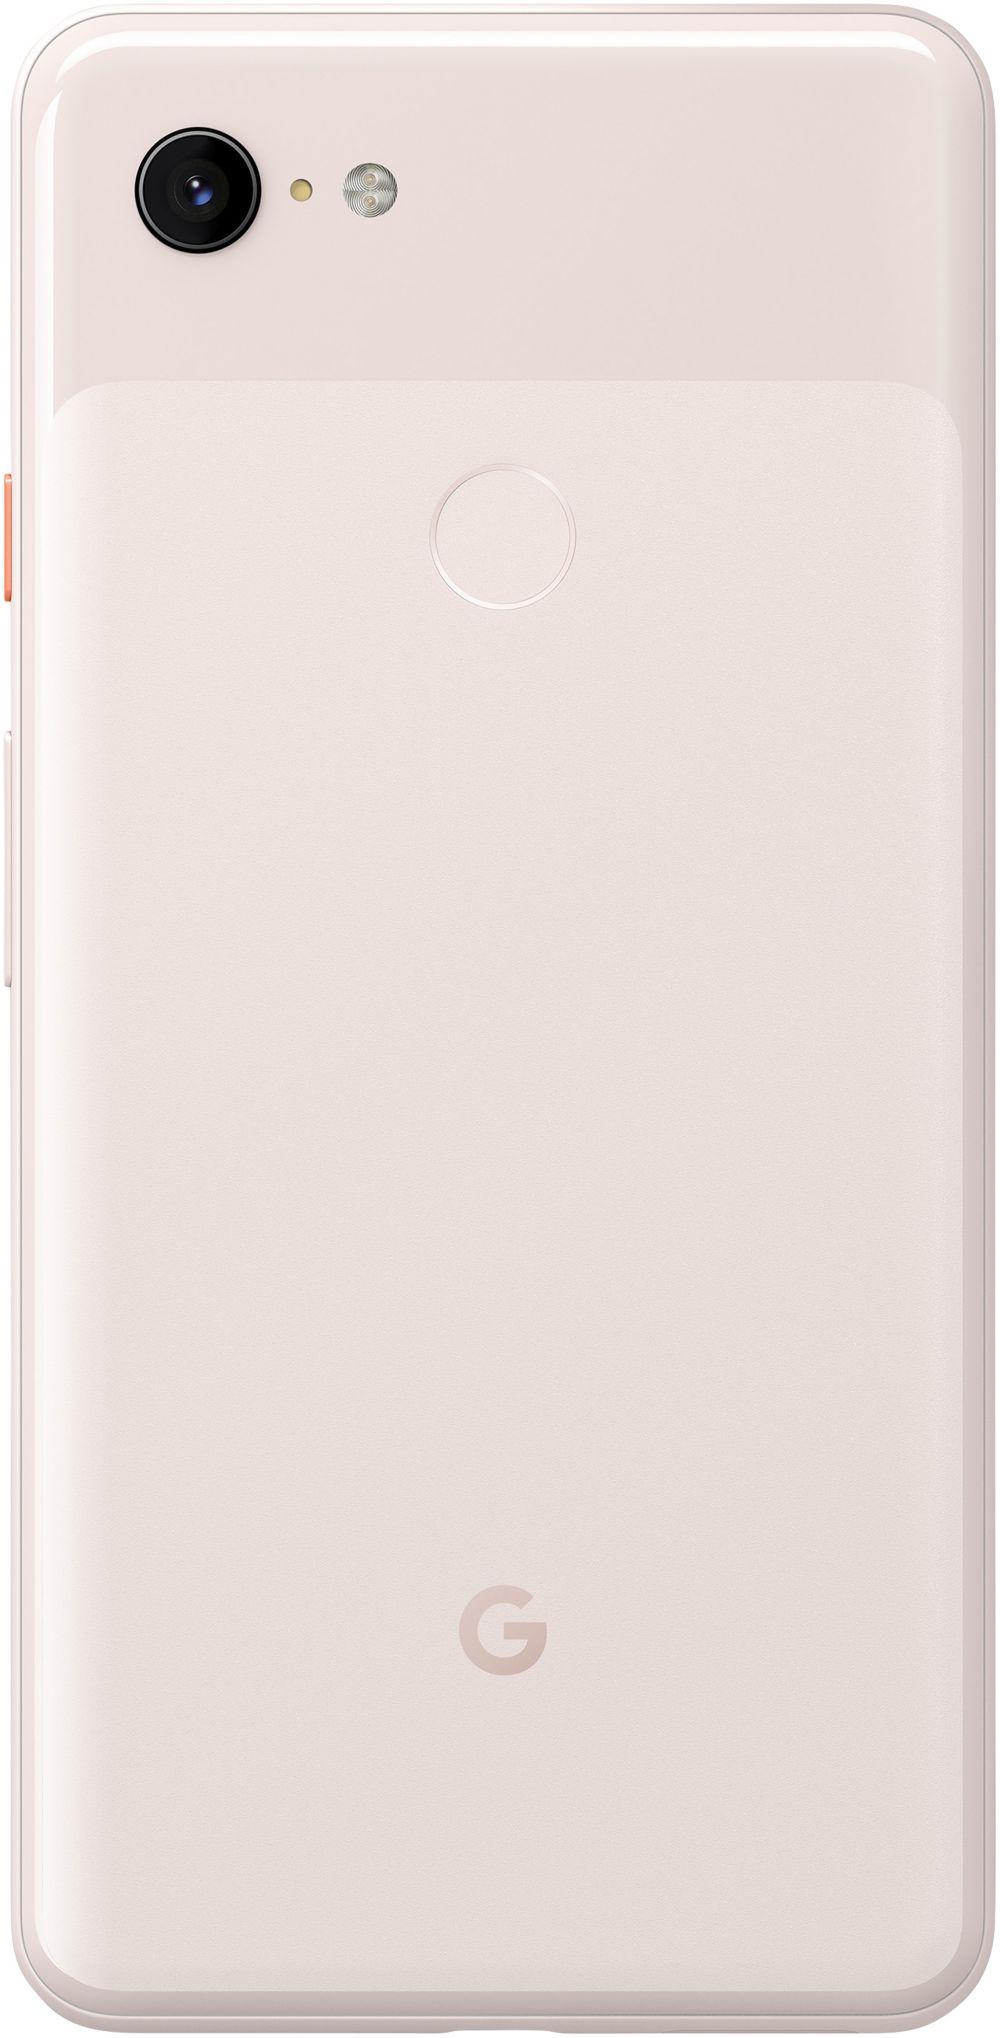 Smartphone Google Pixel 3 XL